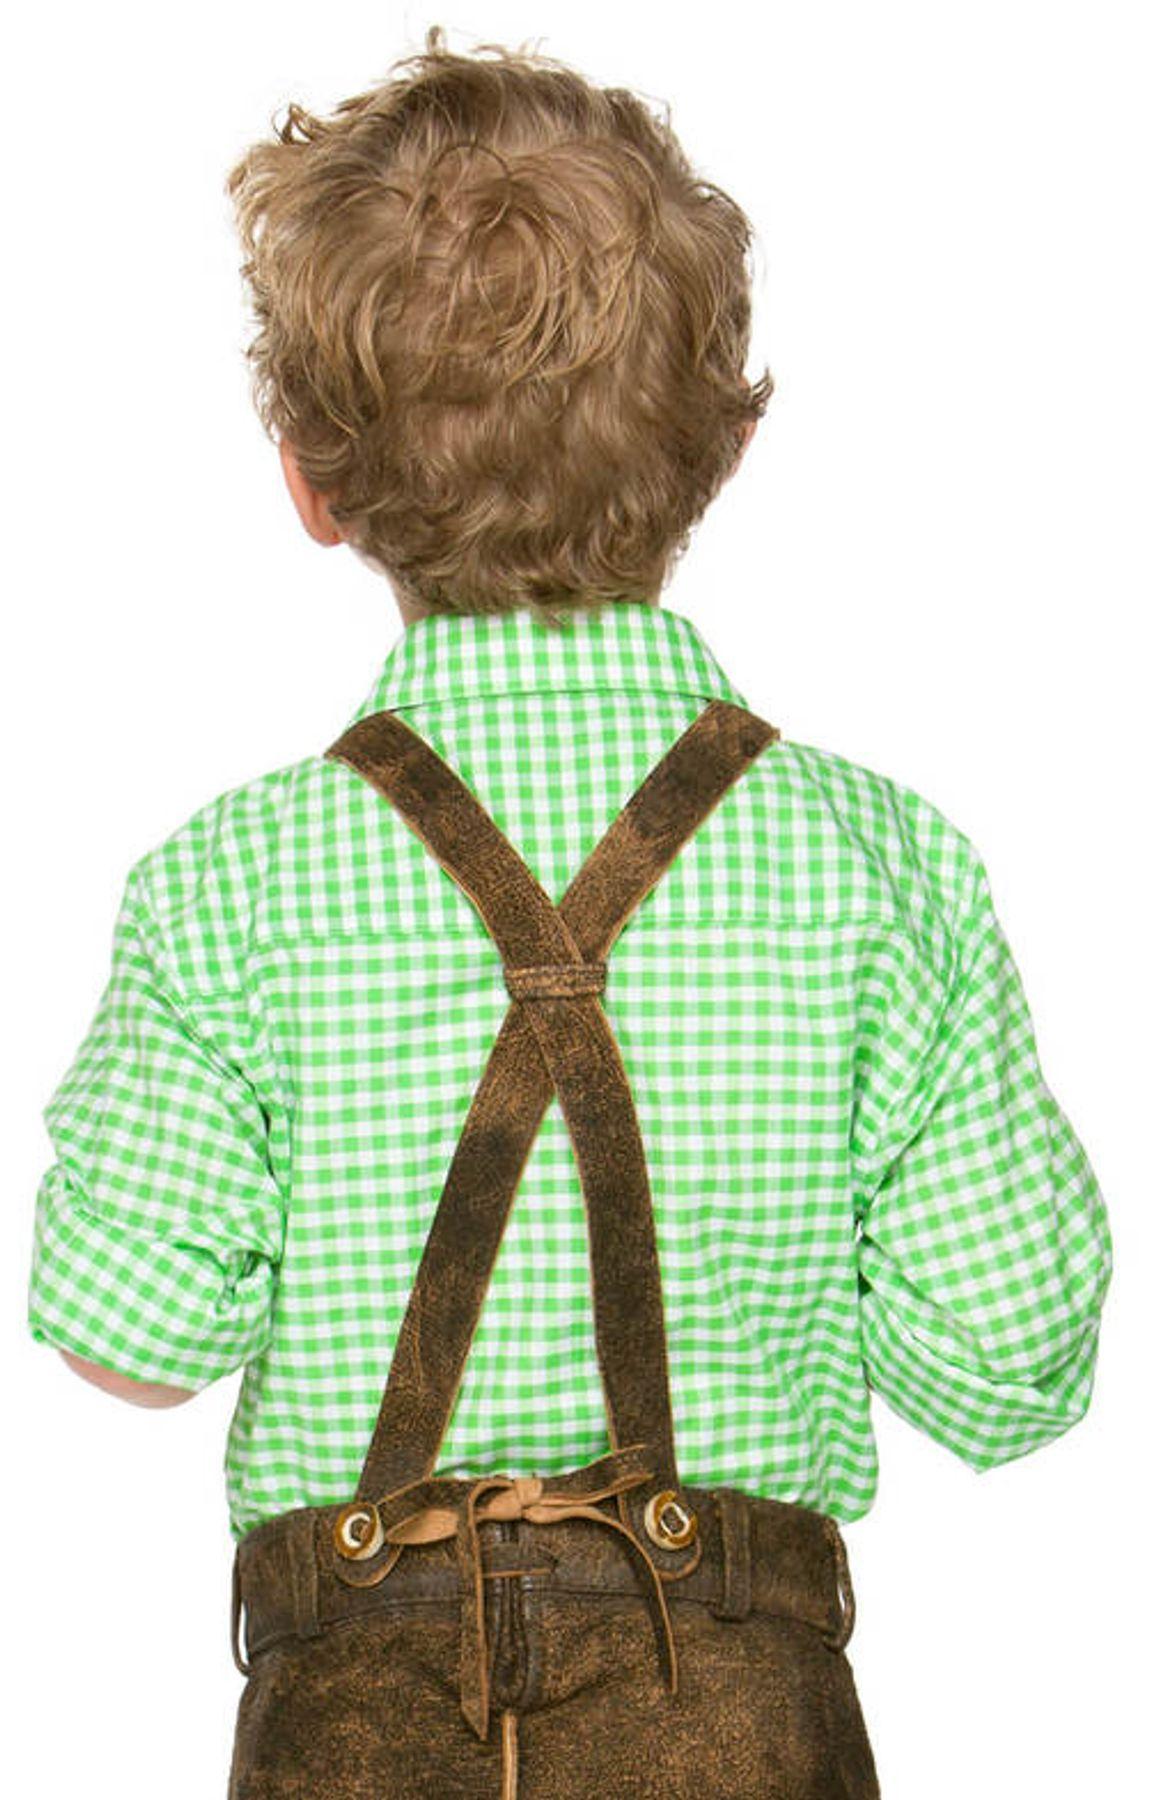 Stockerpoint - Kinder Trachten Hemd Leo, Gr. 122-152 – Bild 3